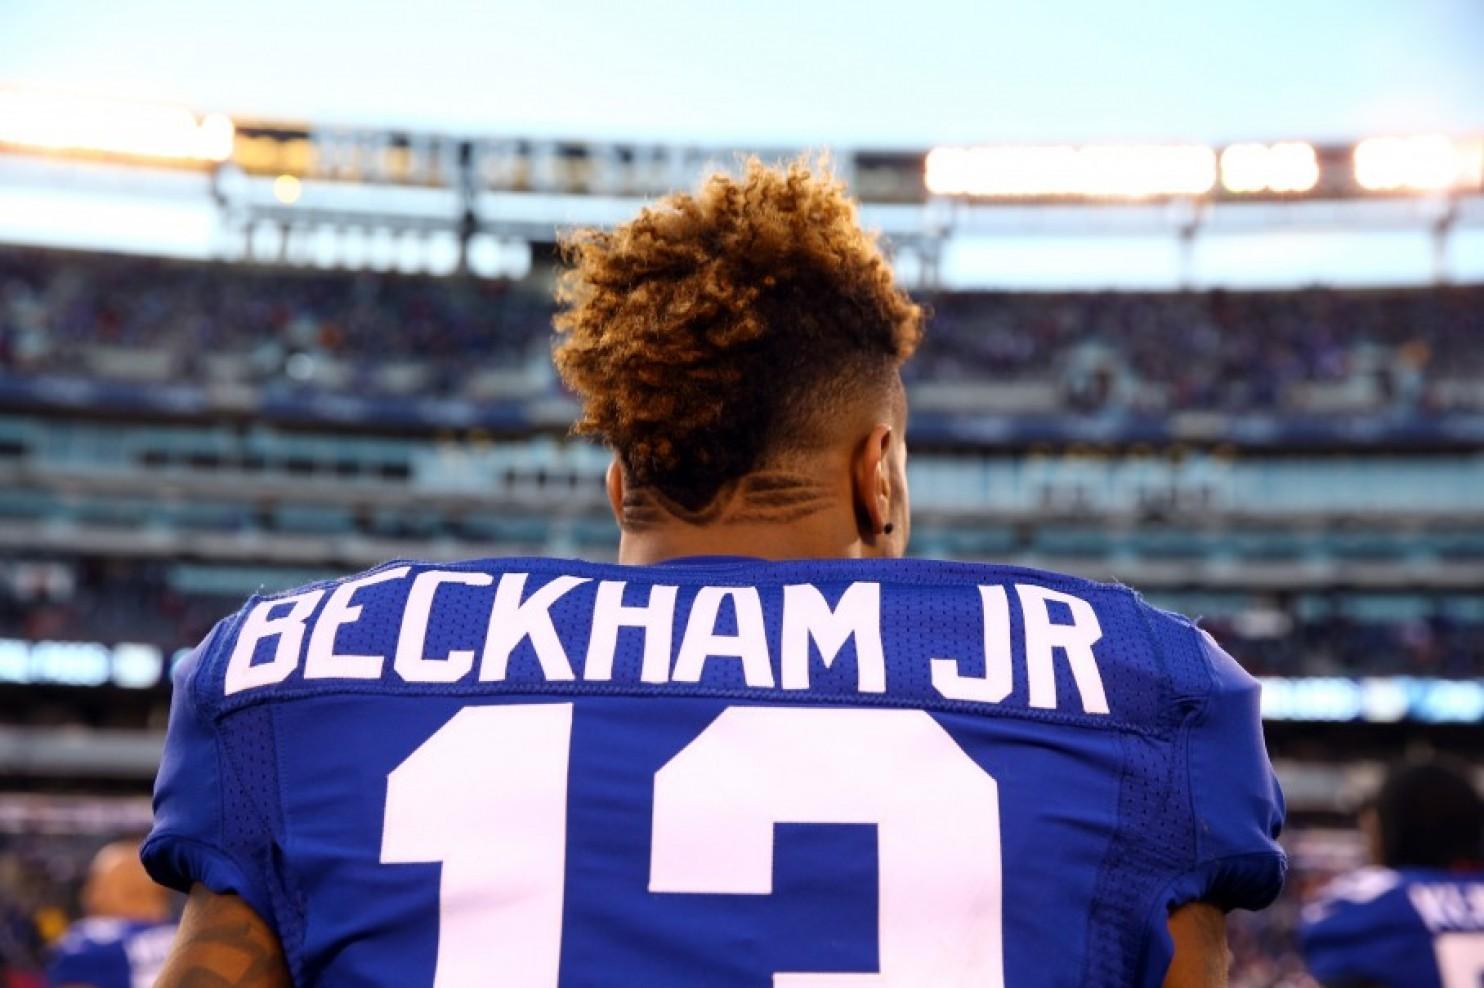 Beckham Jr Hair